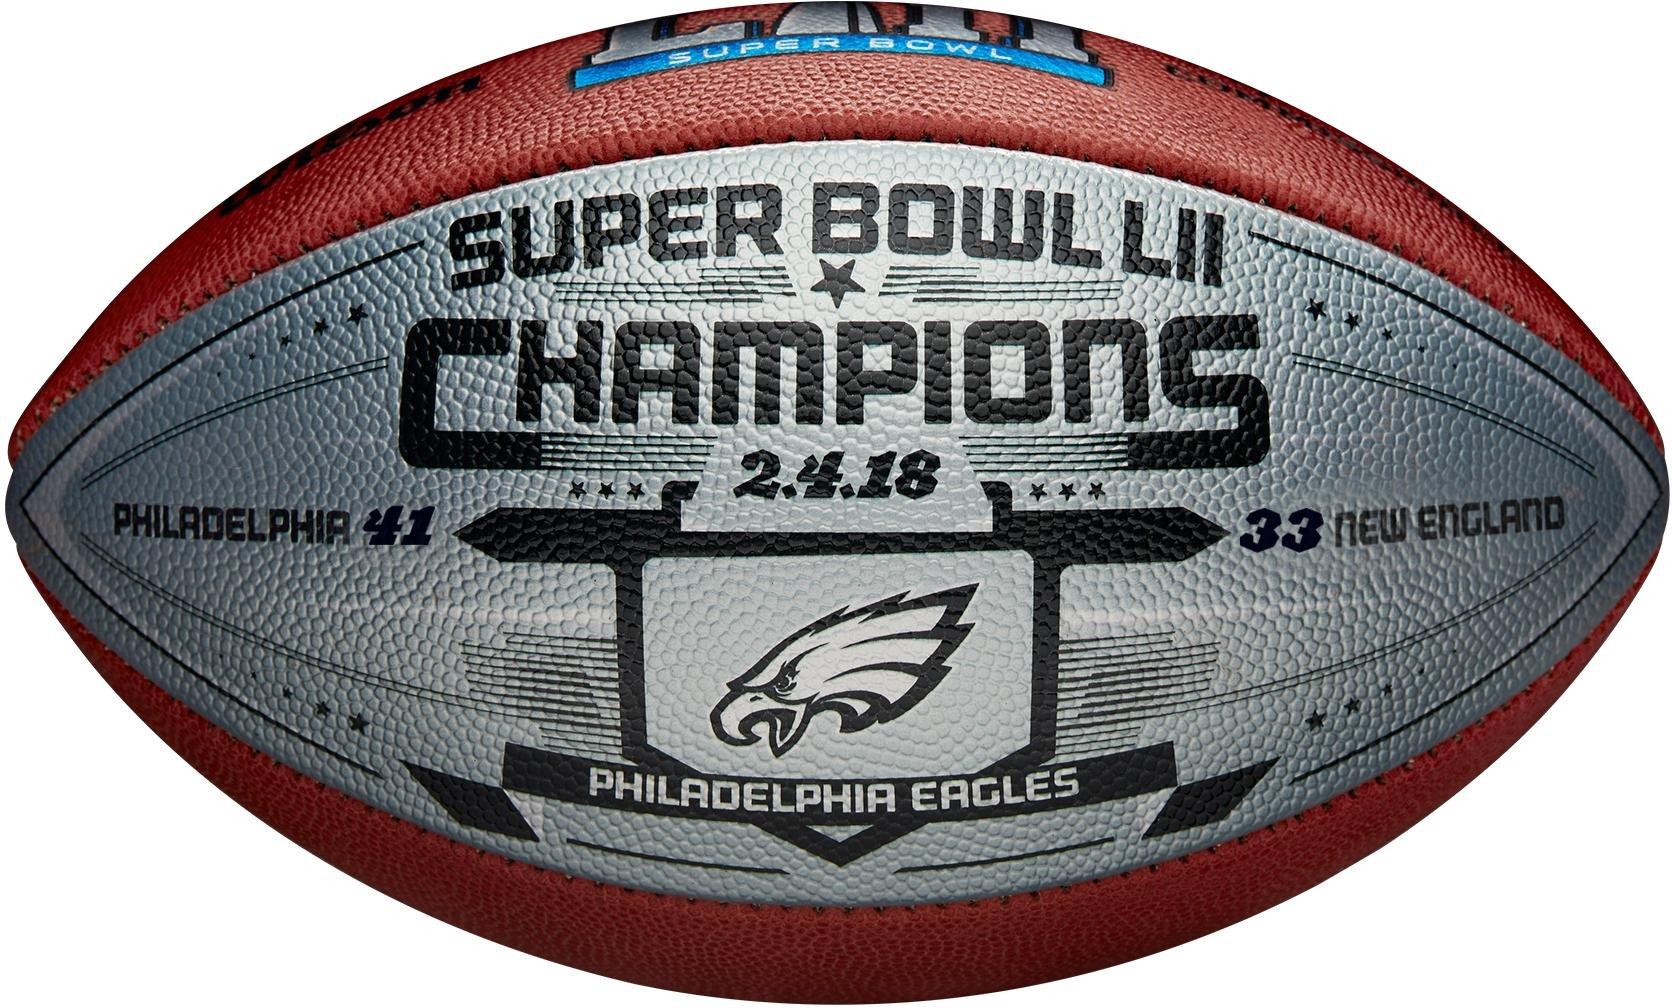 Philadelphia Eagles Super Bowl LII Champions Commemorative Wilson Football with Silver Metallic Panel - Fanatics Authentic Certified